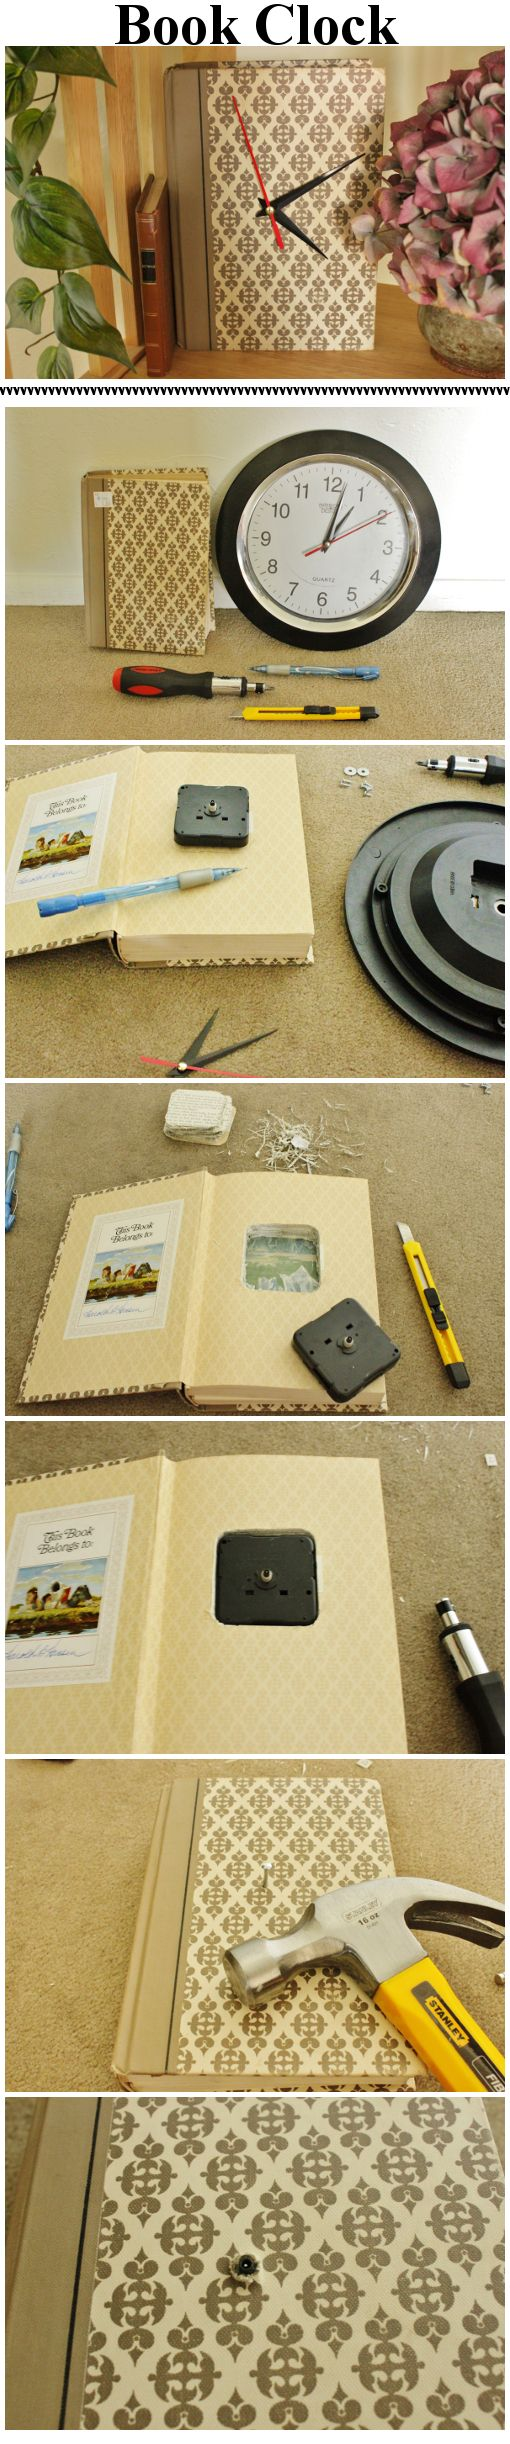 Dollar Store clock and DI book combine into a custom DIY clock for ...